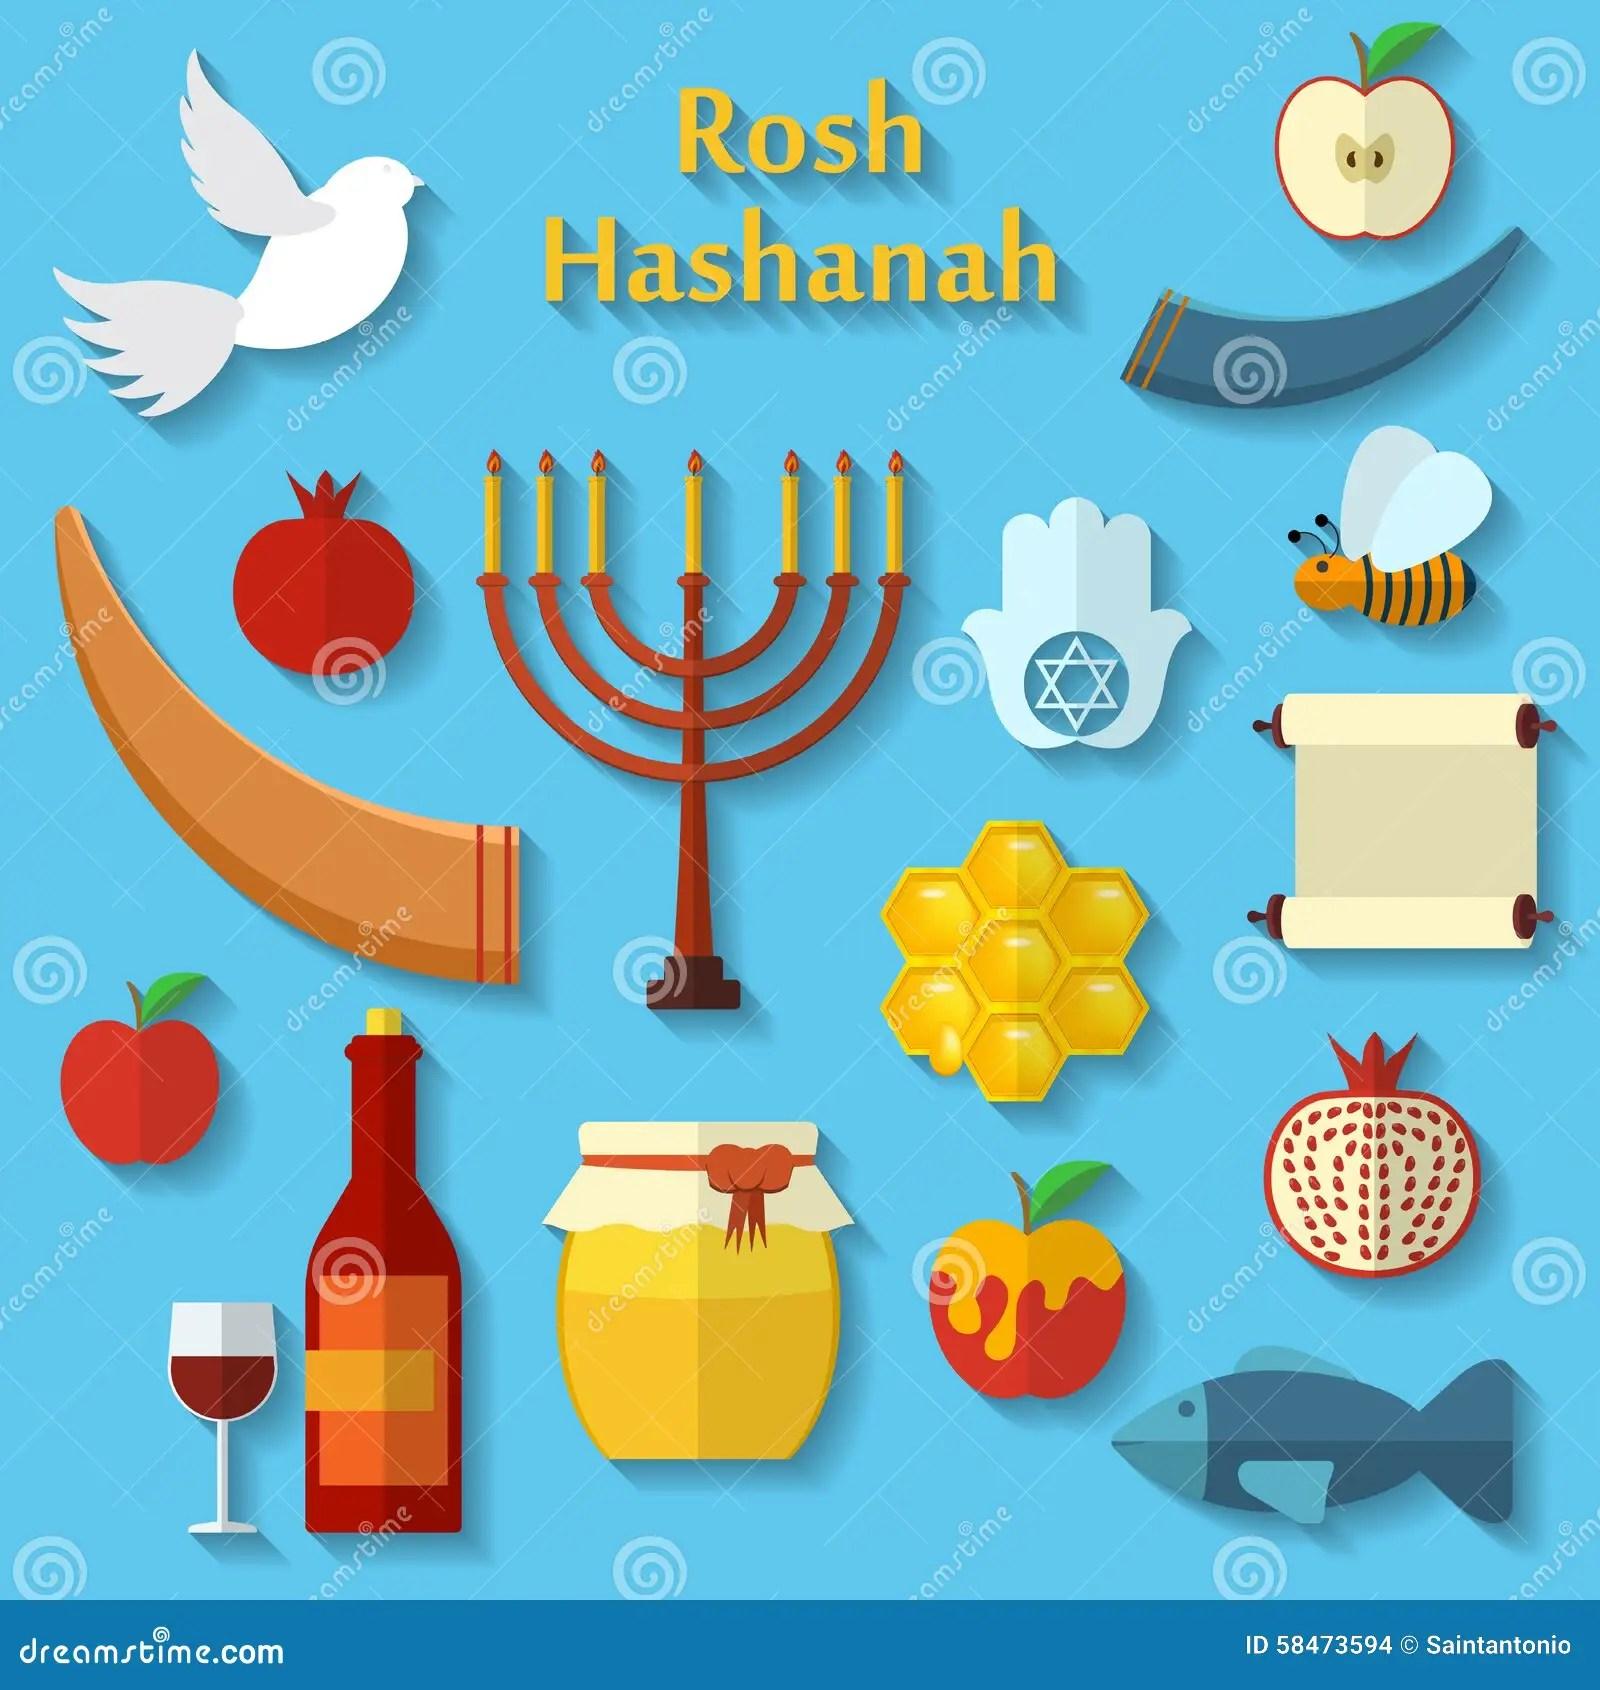 Rosh Hashanah Shana Tova Or Jewish New Year Flat Vector Icons Set With Honey Apple Fish Bee